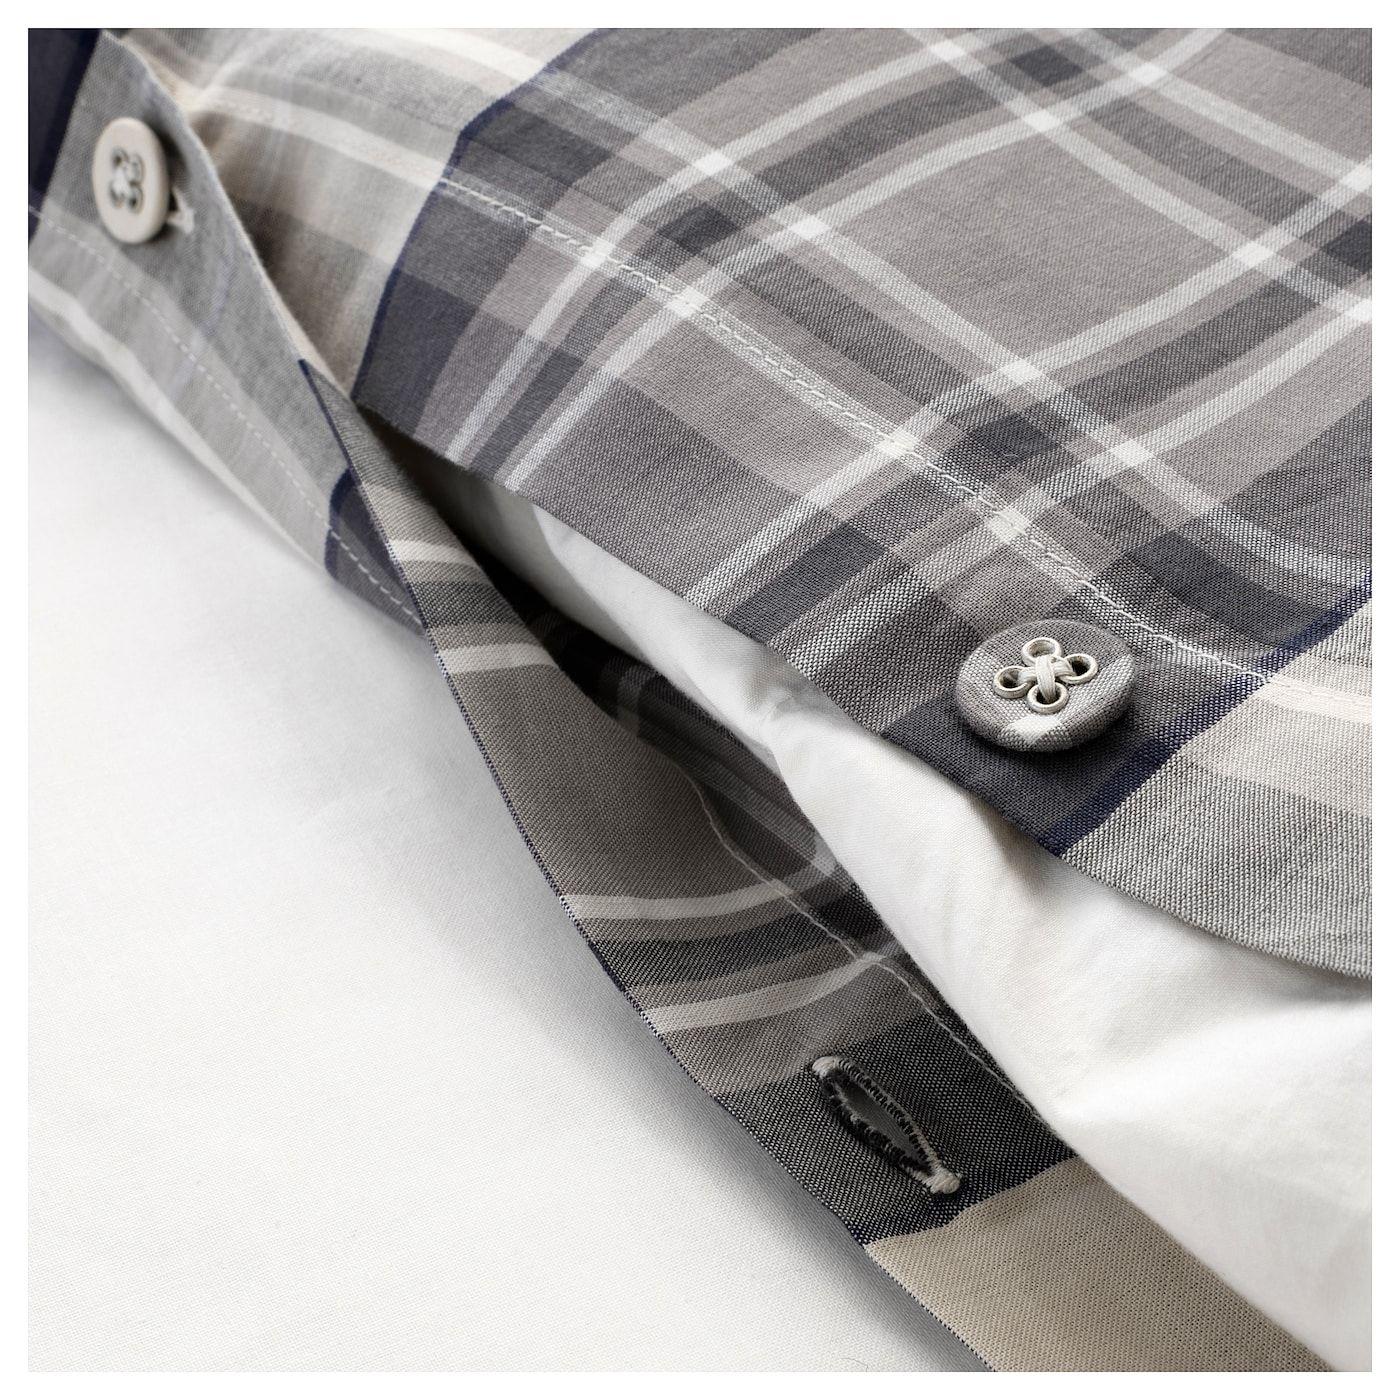 Smalruta Duvet Cover And Pillowcases Gray Check Ikea